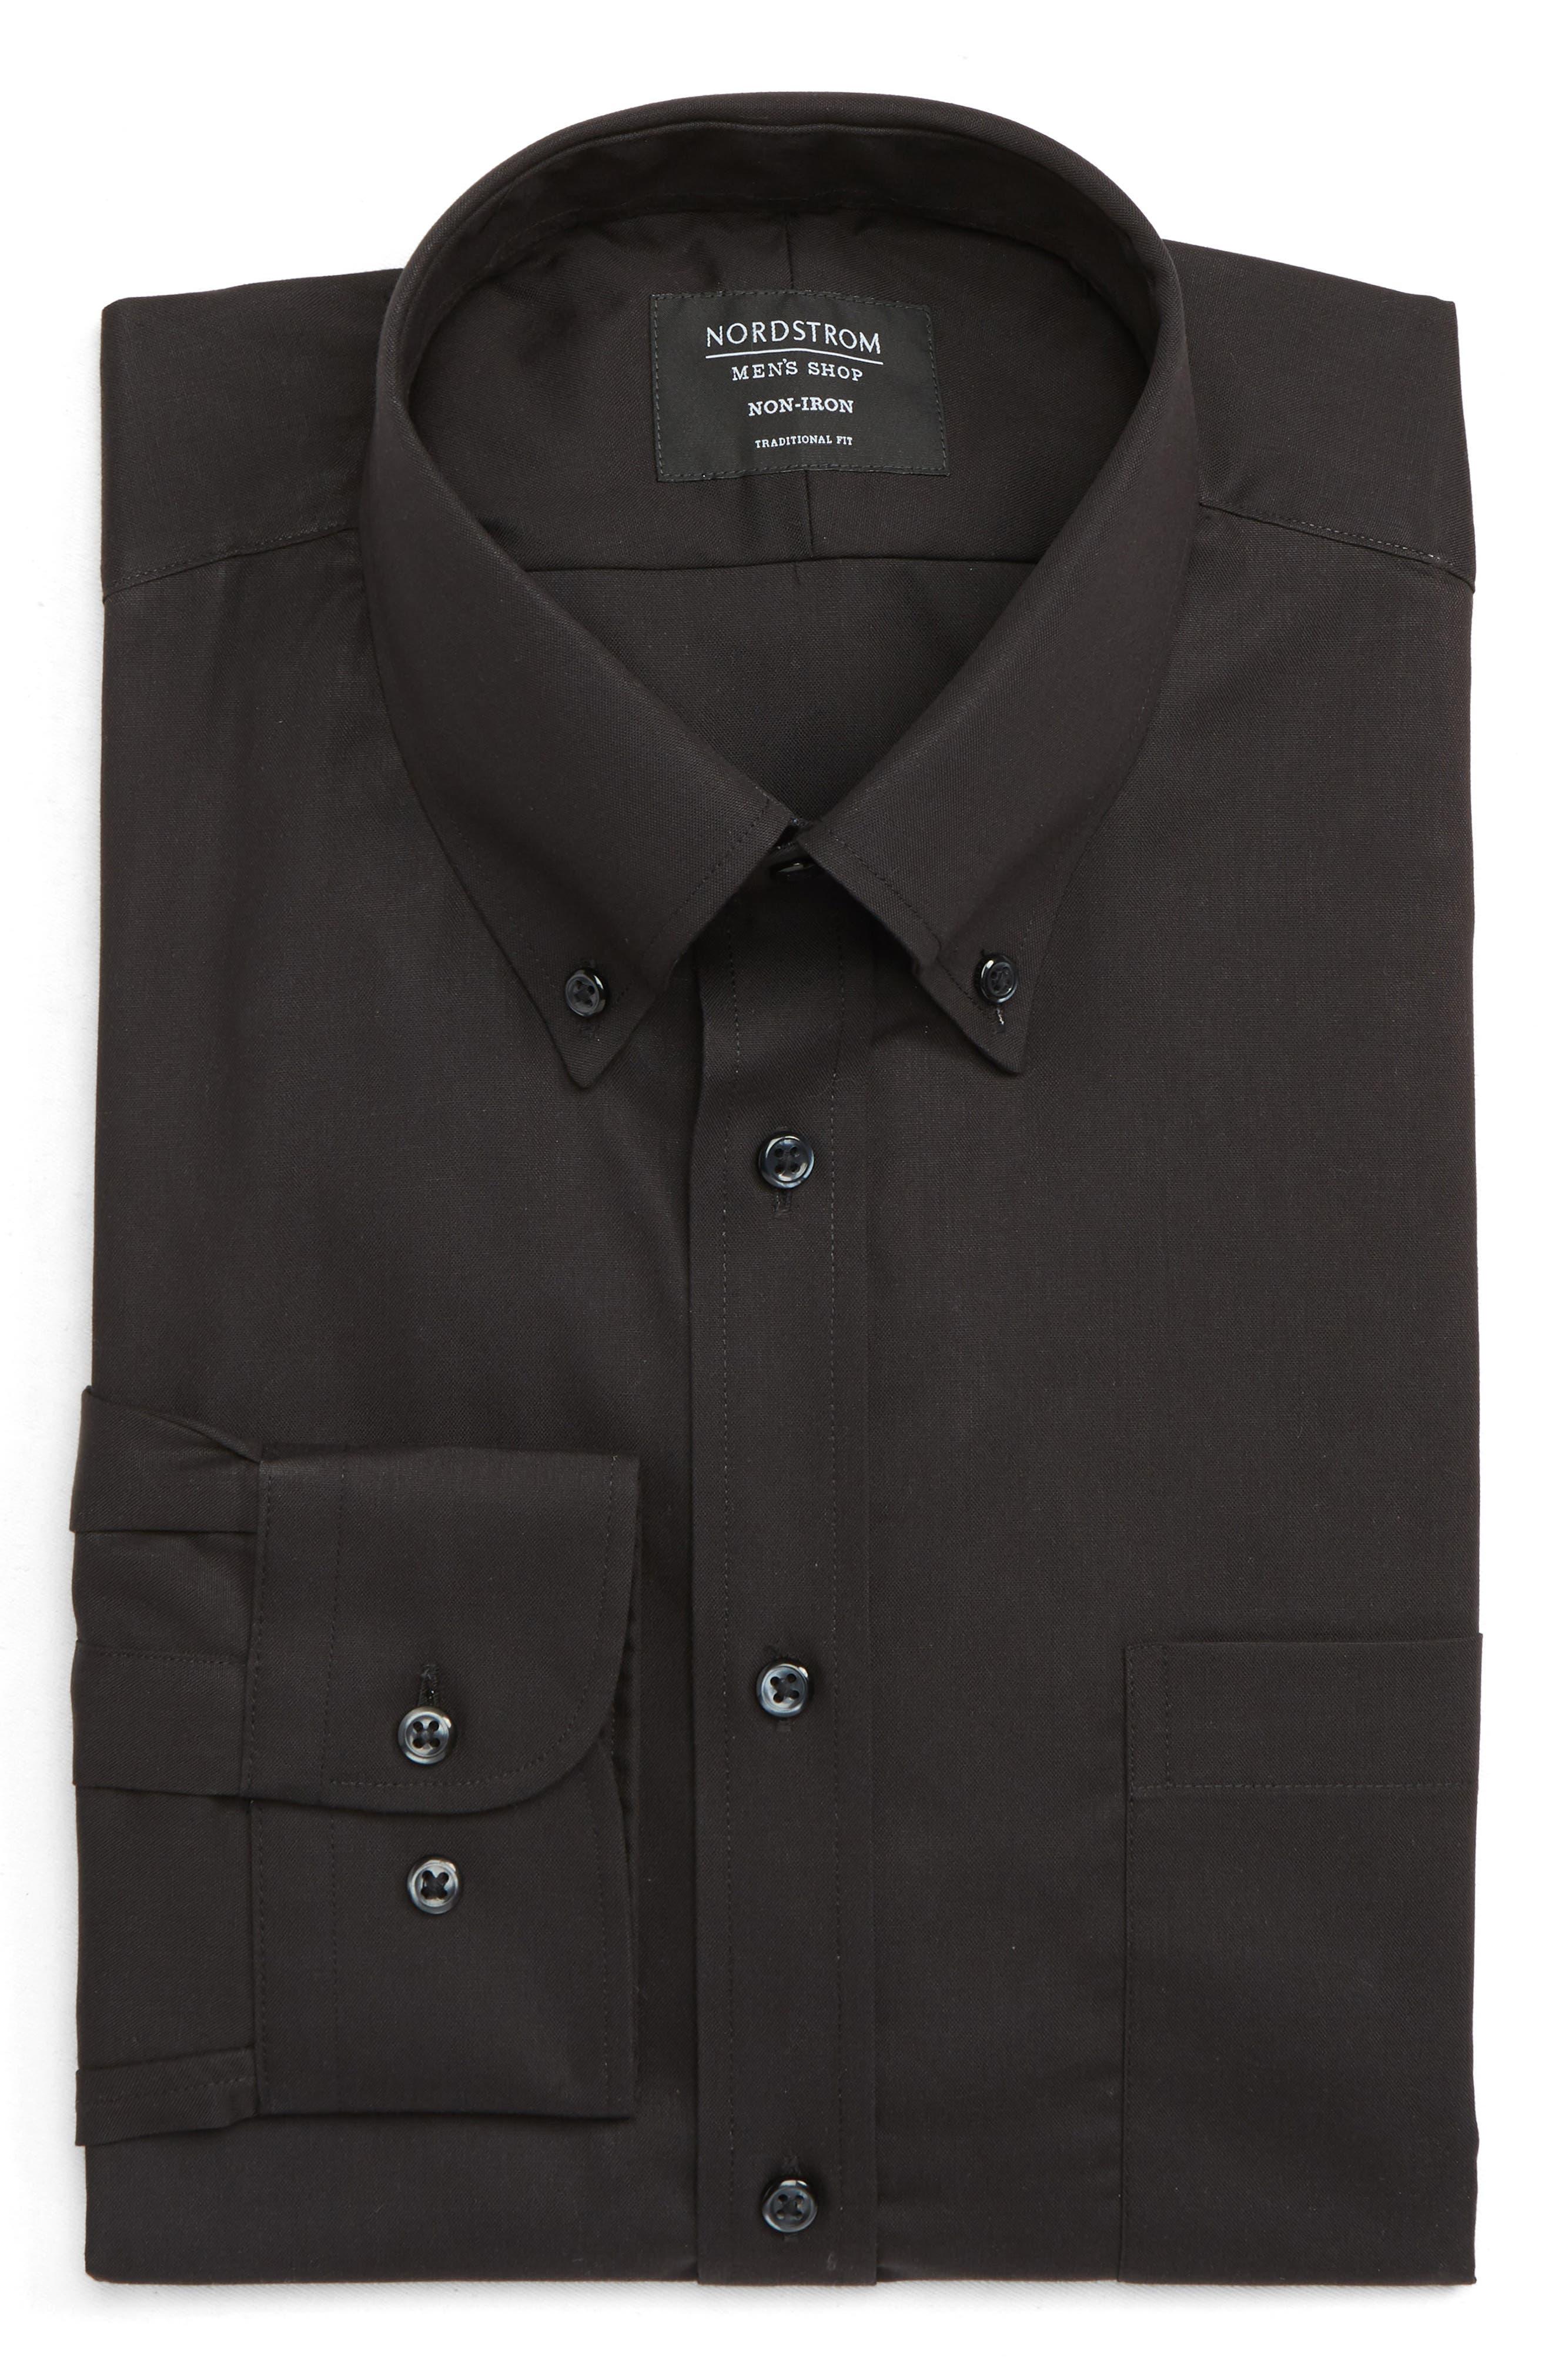 NORDSTROM MEN'S SHOP, Traditional Fit Non-Iron Dress Shirt, Main thumbnail 1, color, BLACK